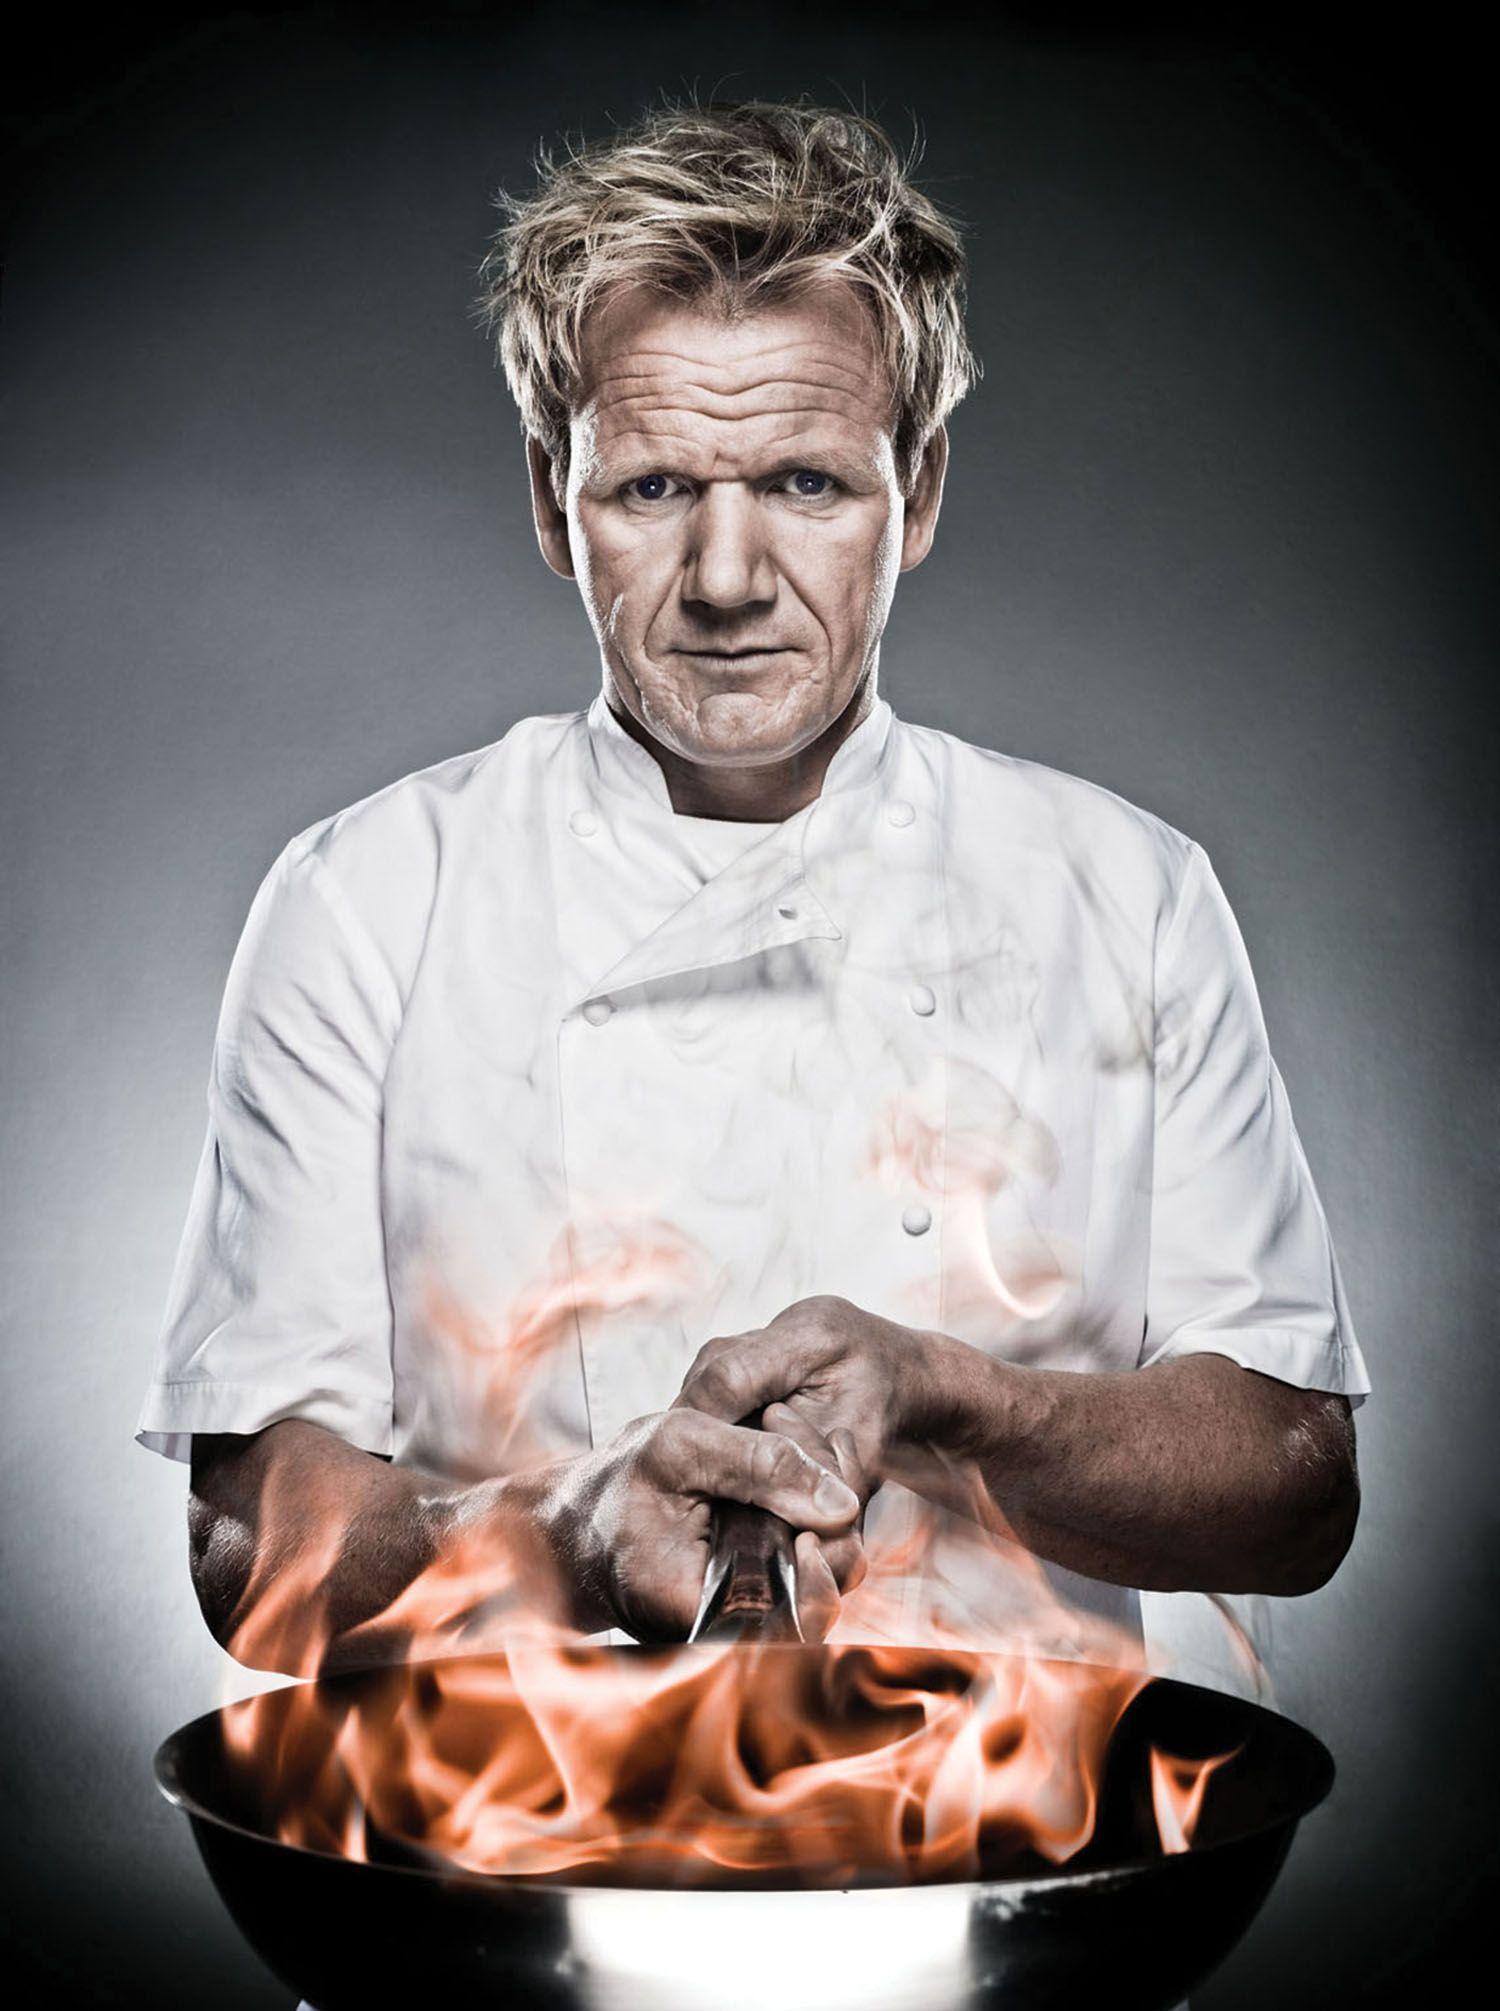 Who Chef